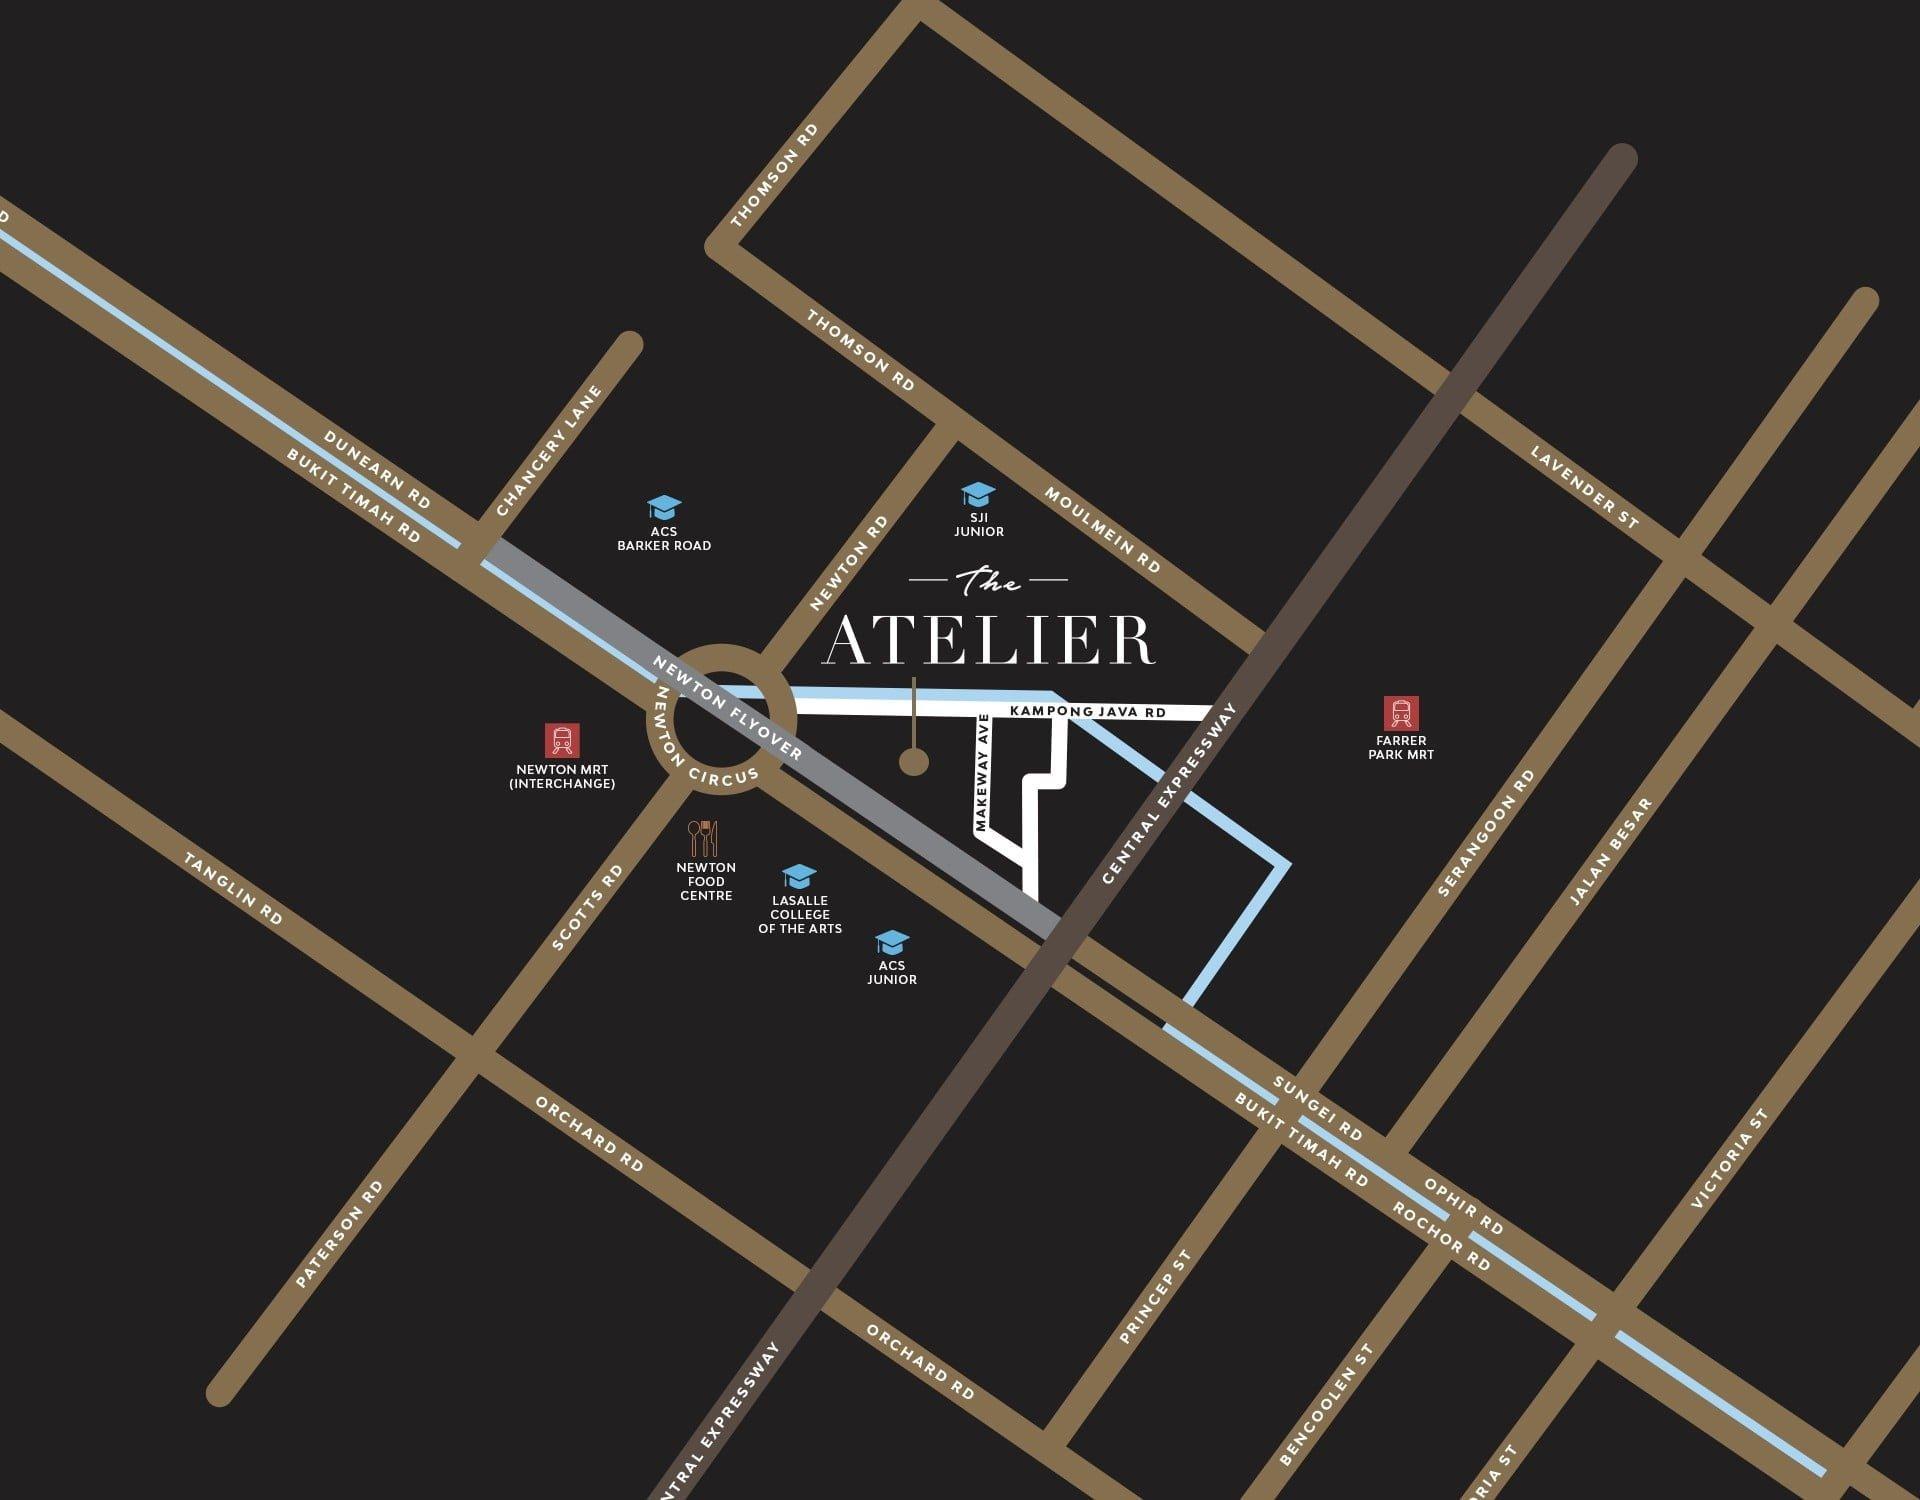 the-atelier-condo map